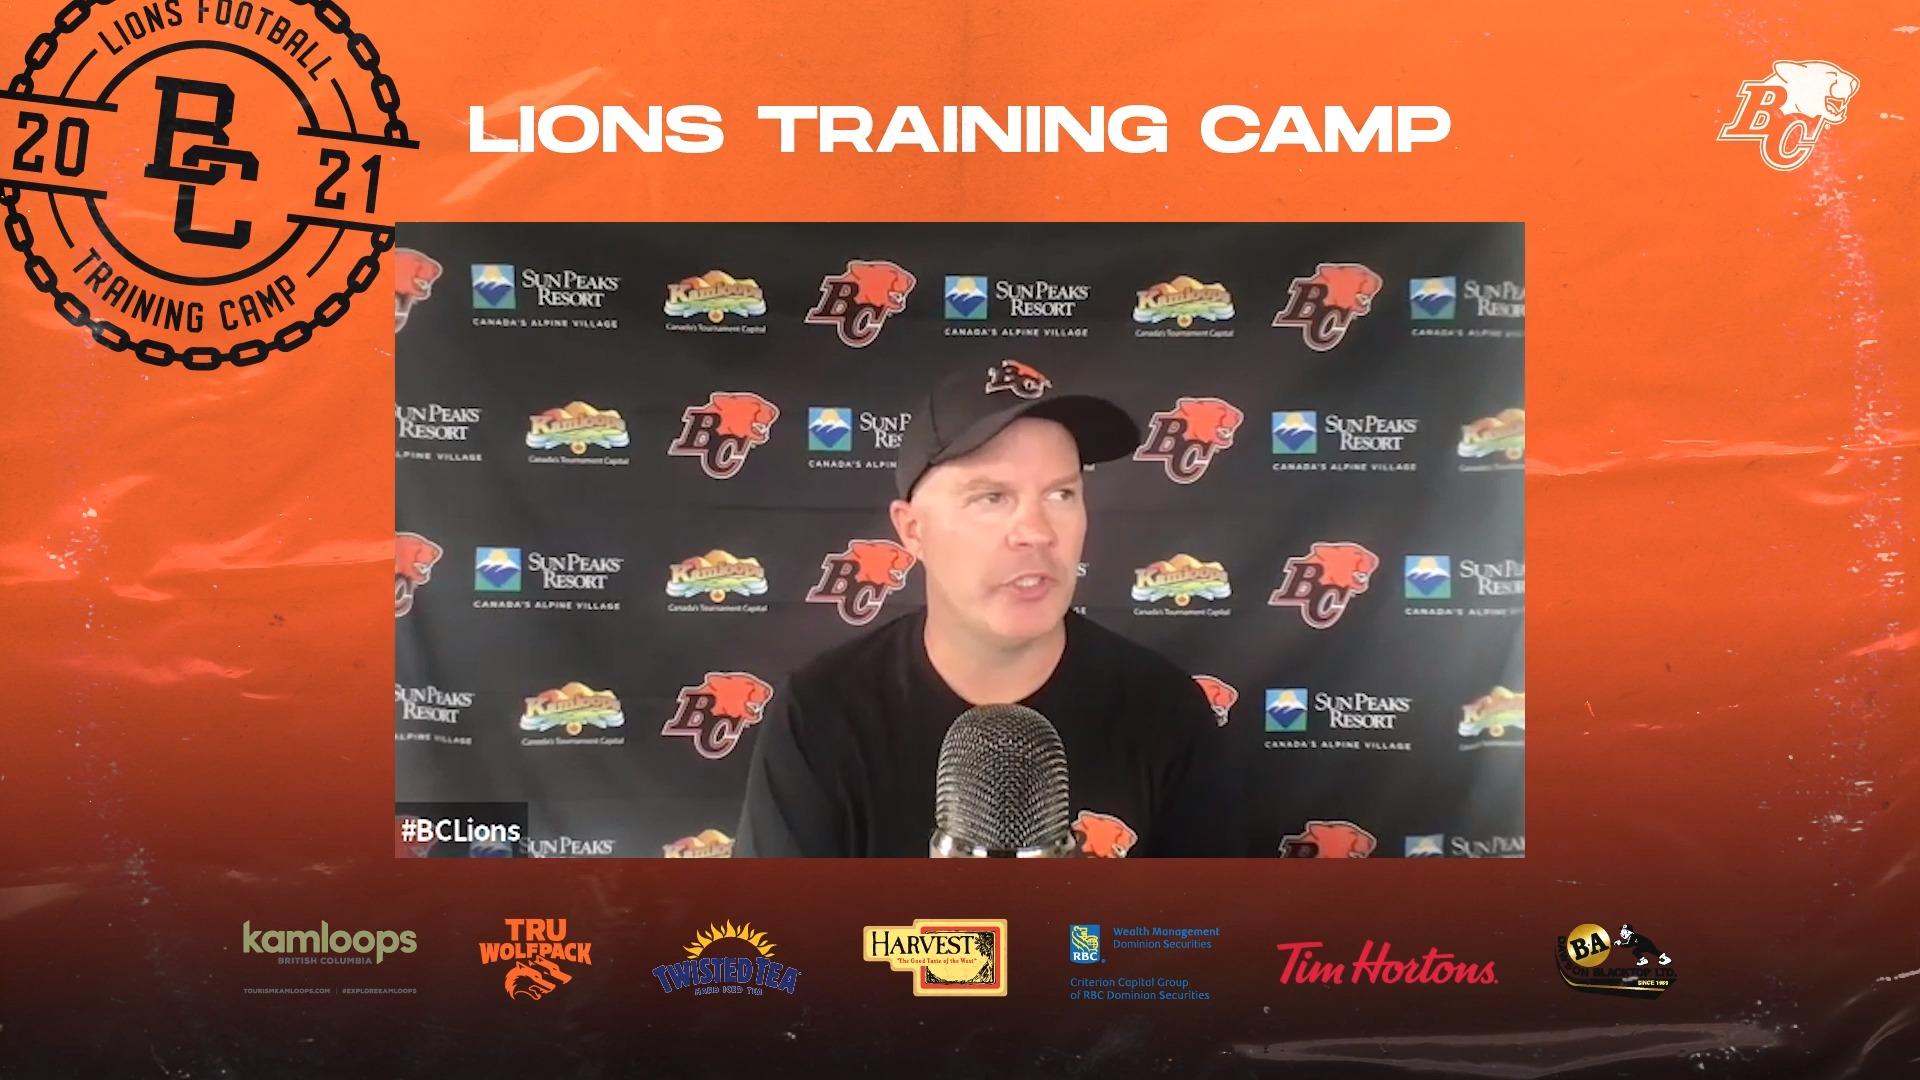 Training Camp July 23 | Rick Campbell